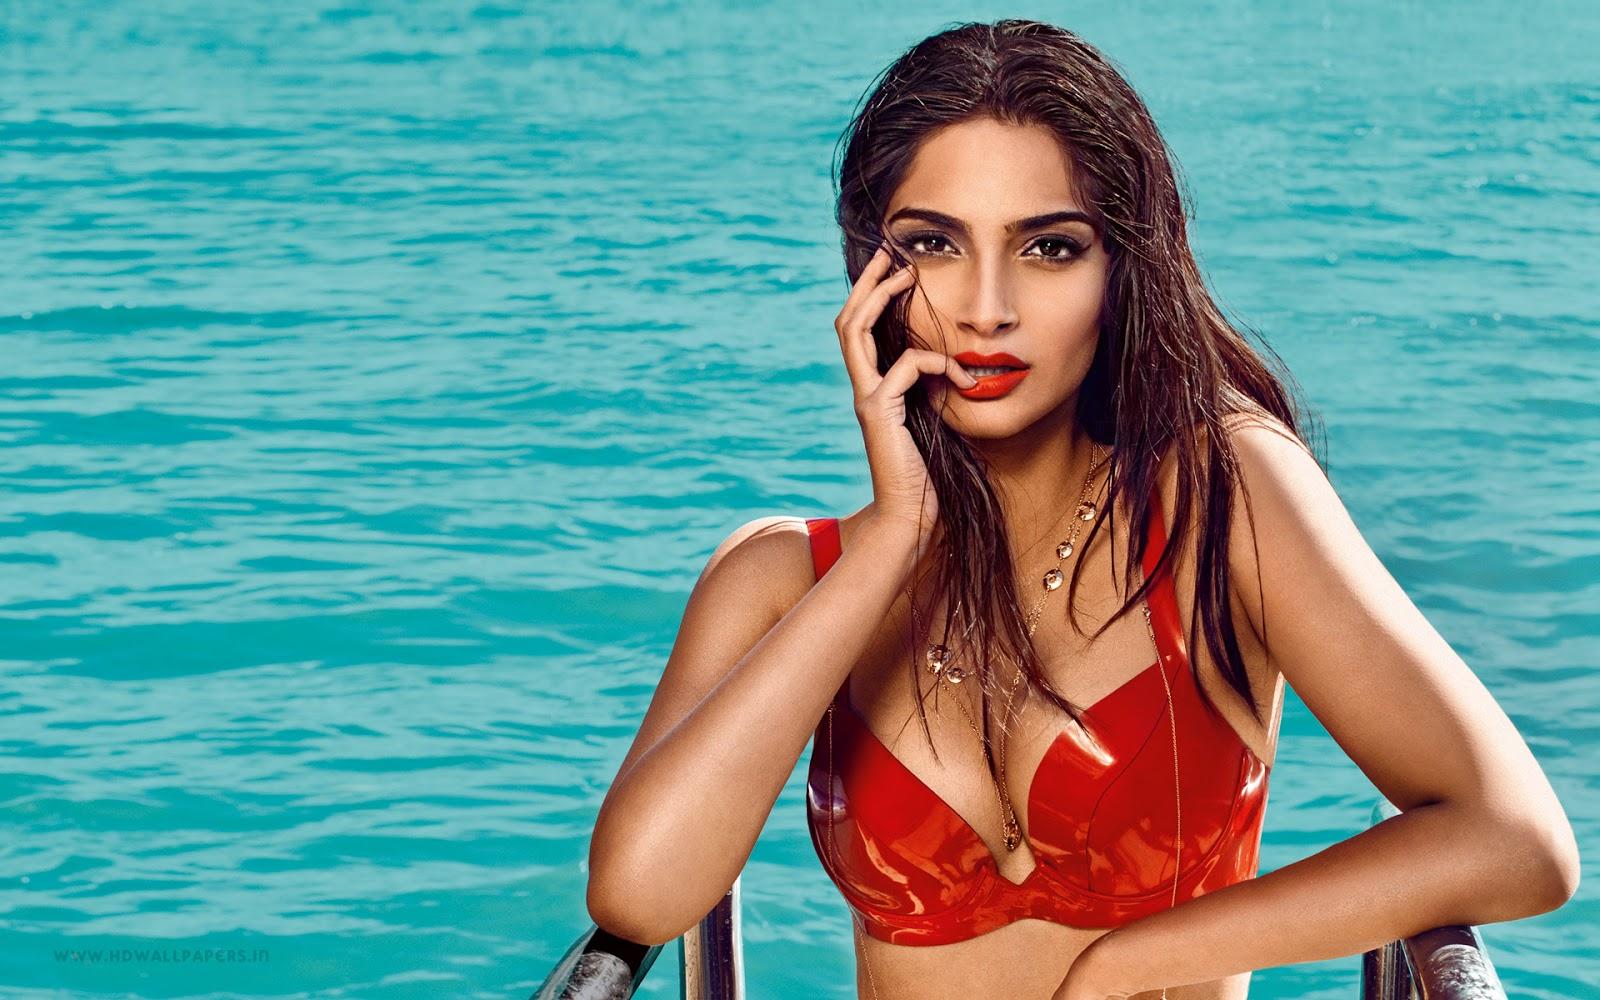 Bollywood Actress Sonam Kapoor Hot Wallpaper HD